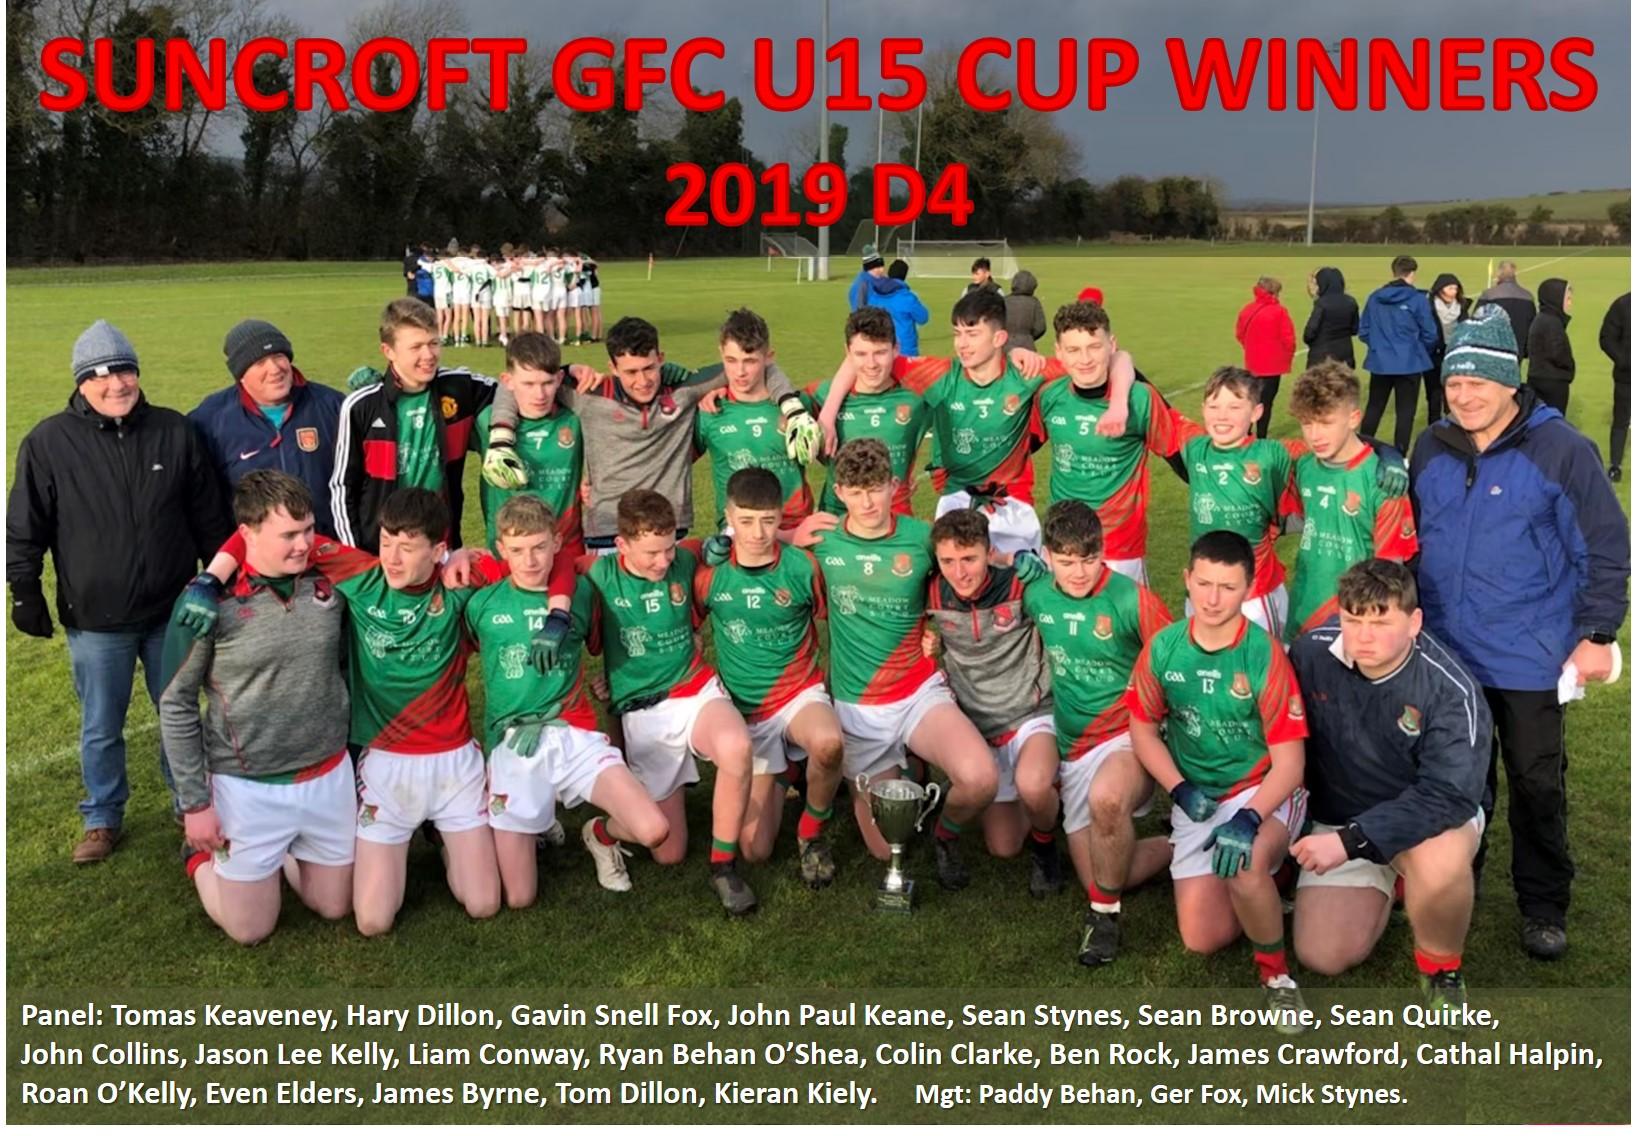 U15 D4 Cup Winners 2019